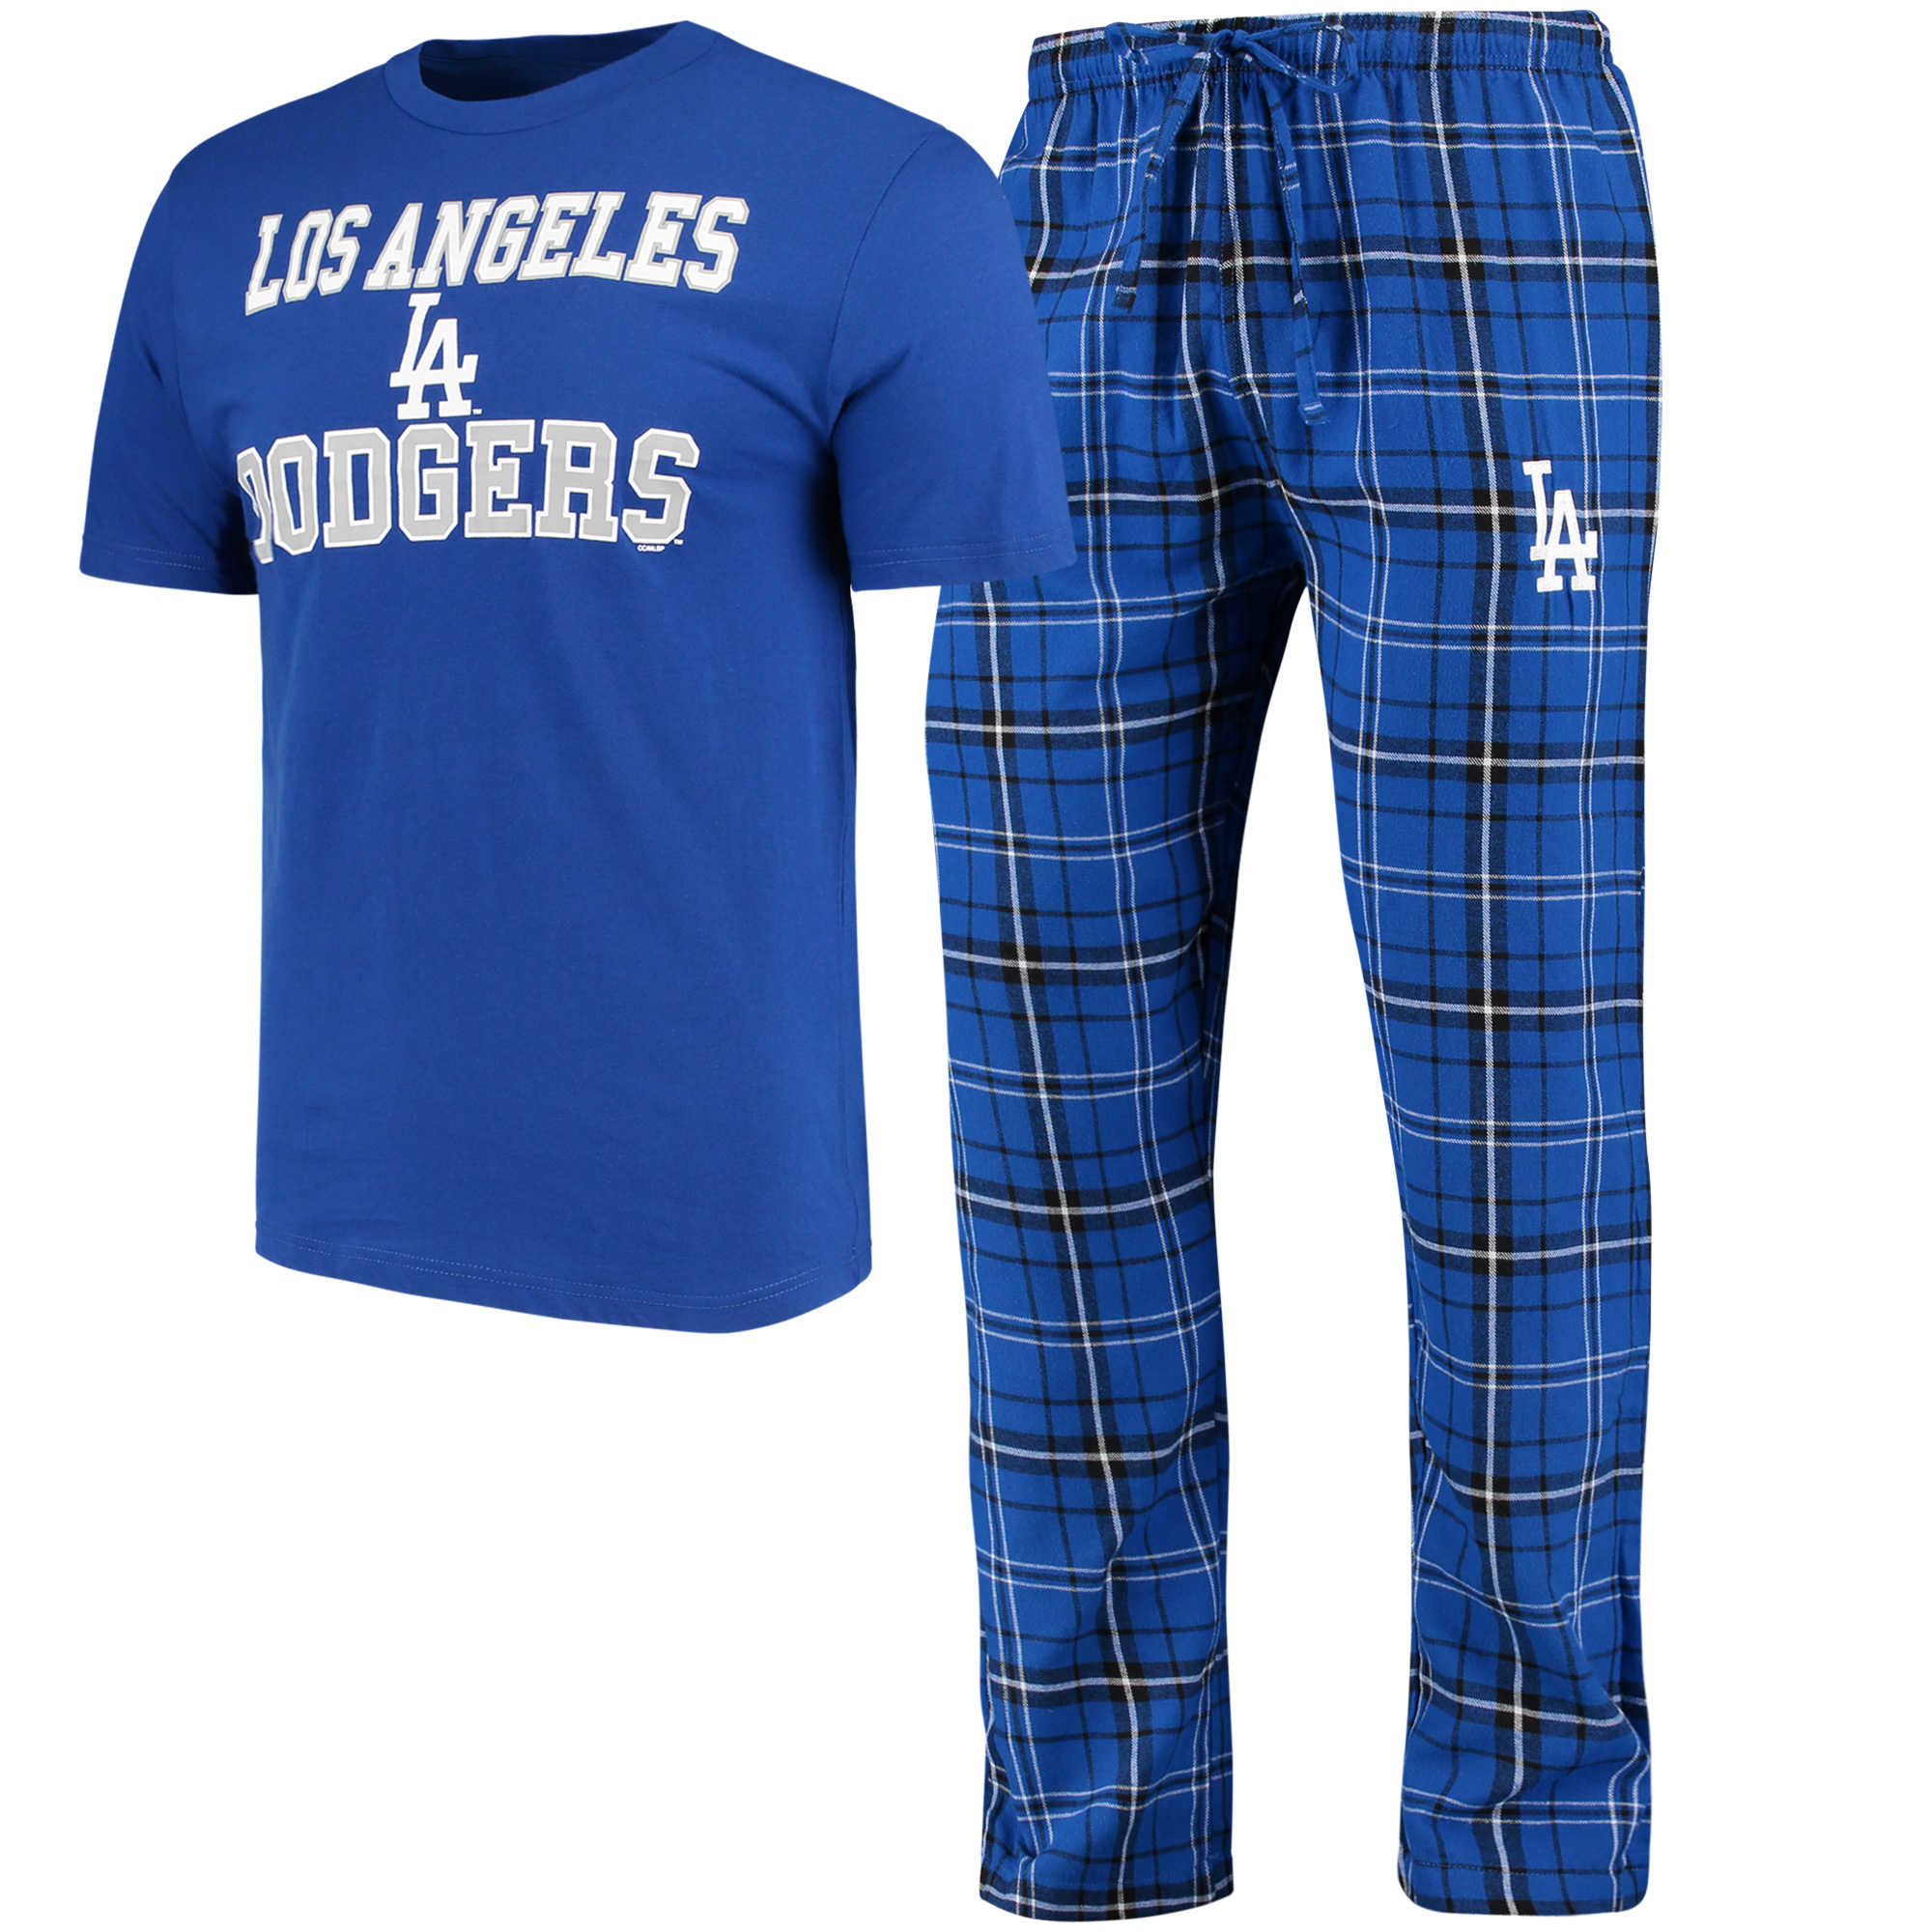 Los Angeles Dodgers Concepts Sport Halftime Pants and T-Shirt Set - Royal/Black